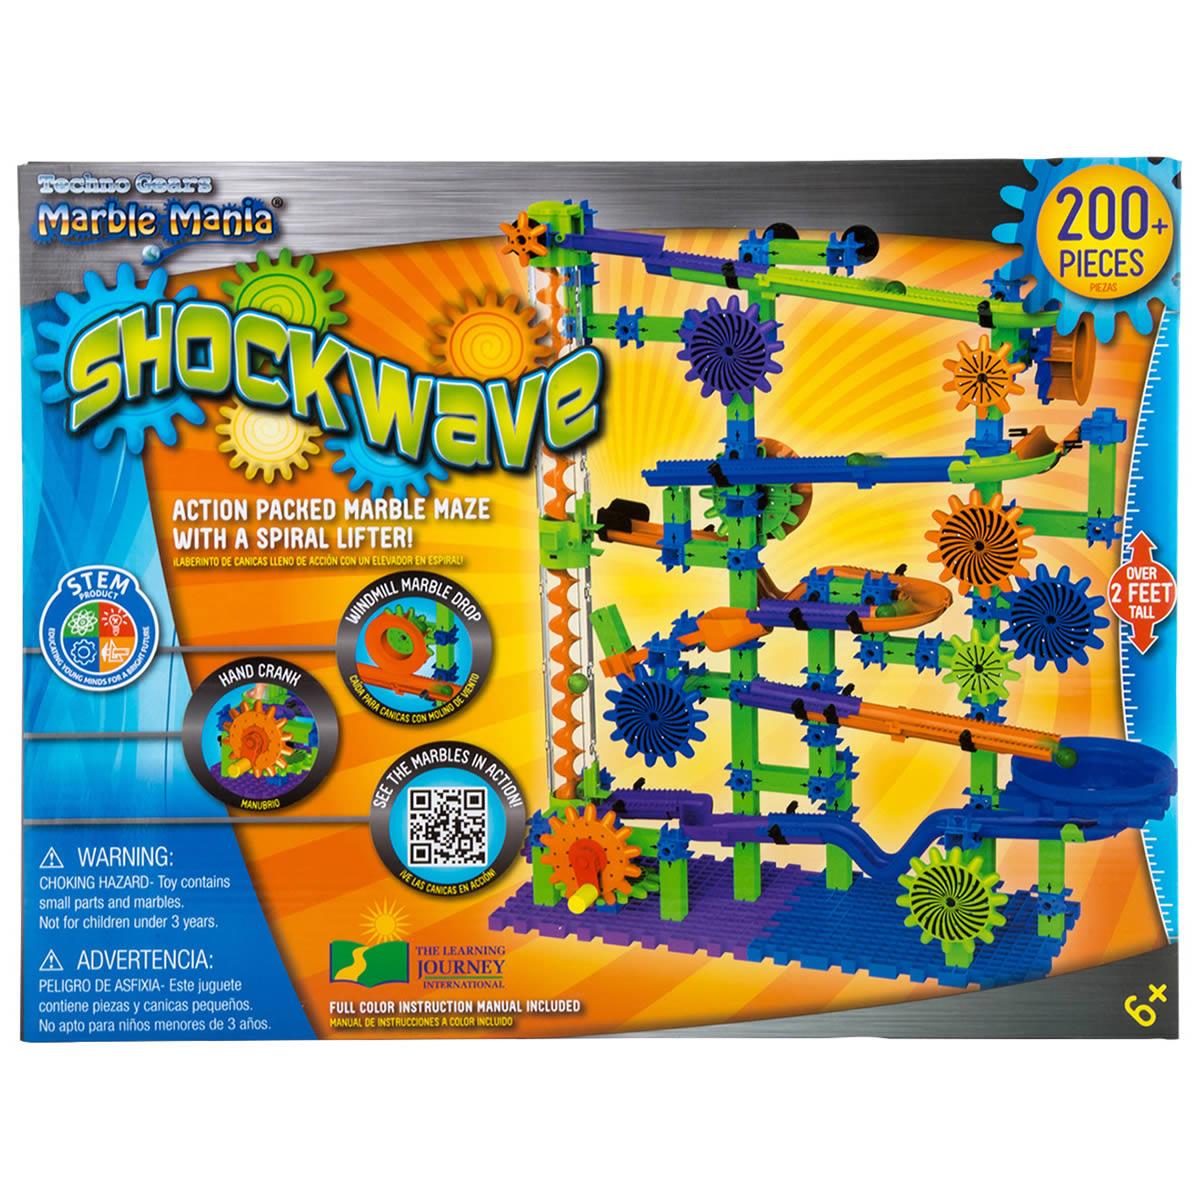 Techno Gears Marble Mania Shockwave Toys Caseys Toys